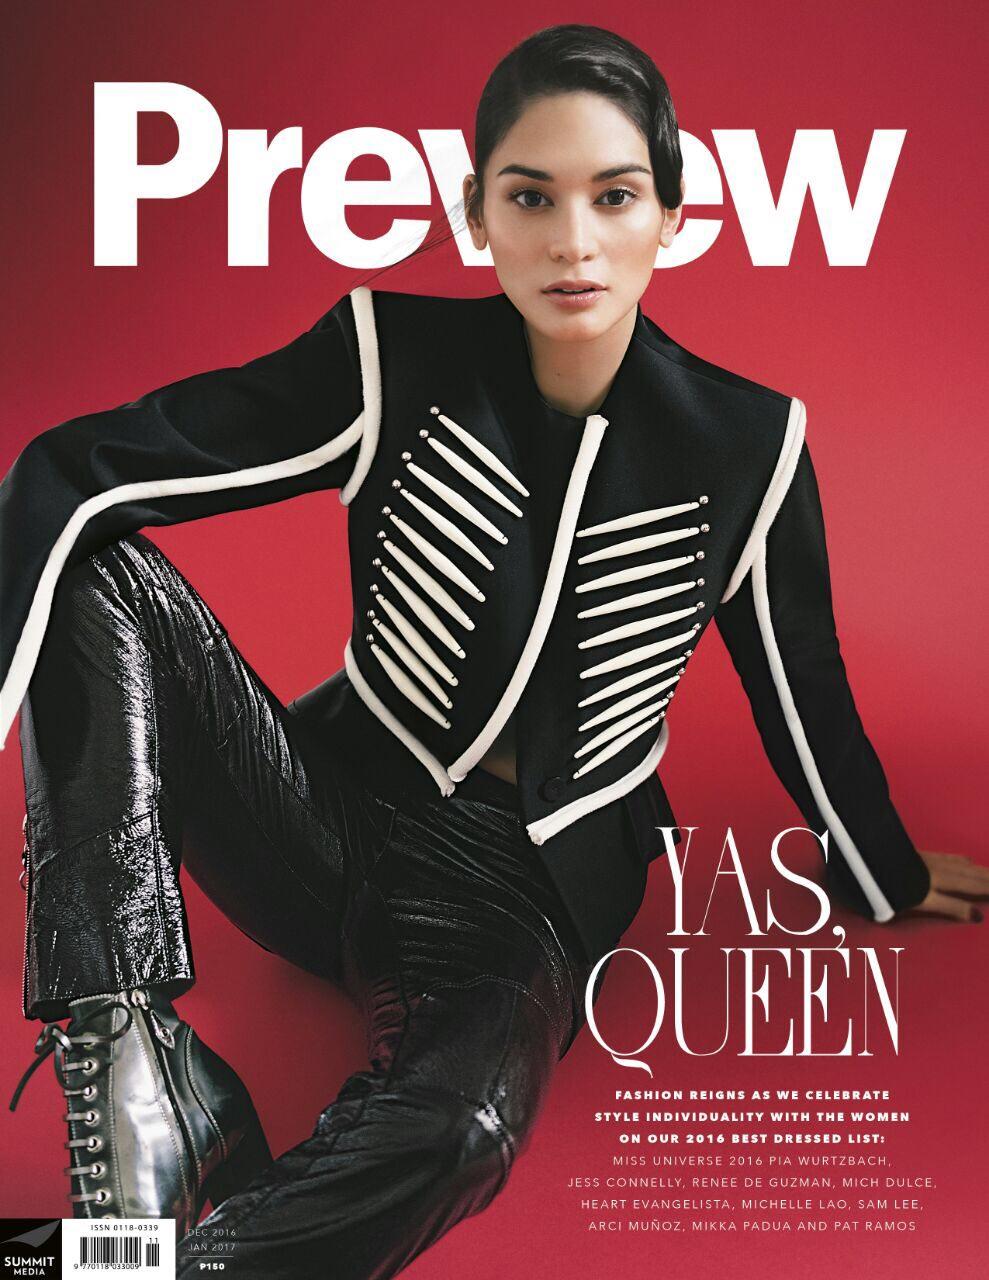 Dec 2016/Jan 2017 cover